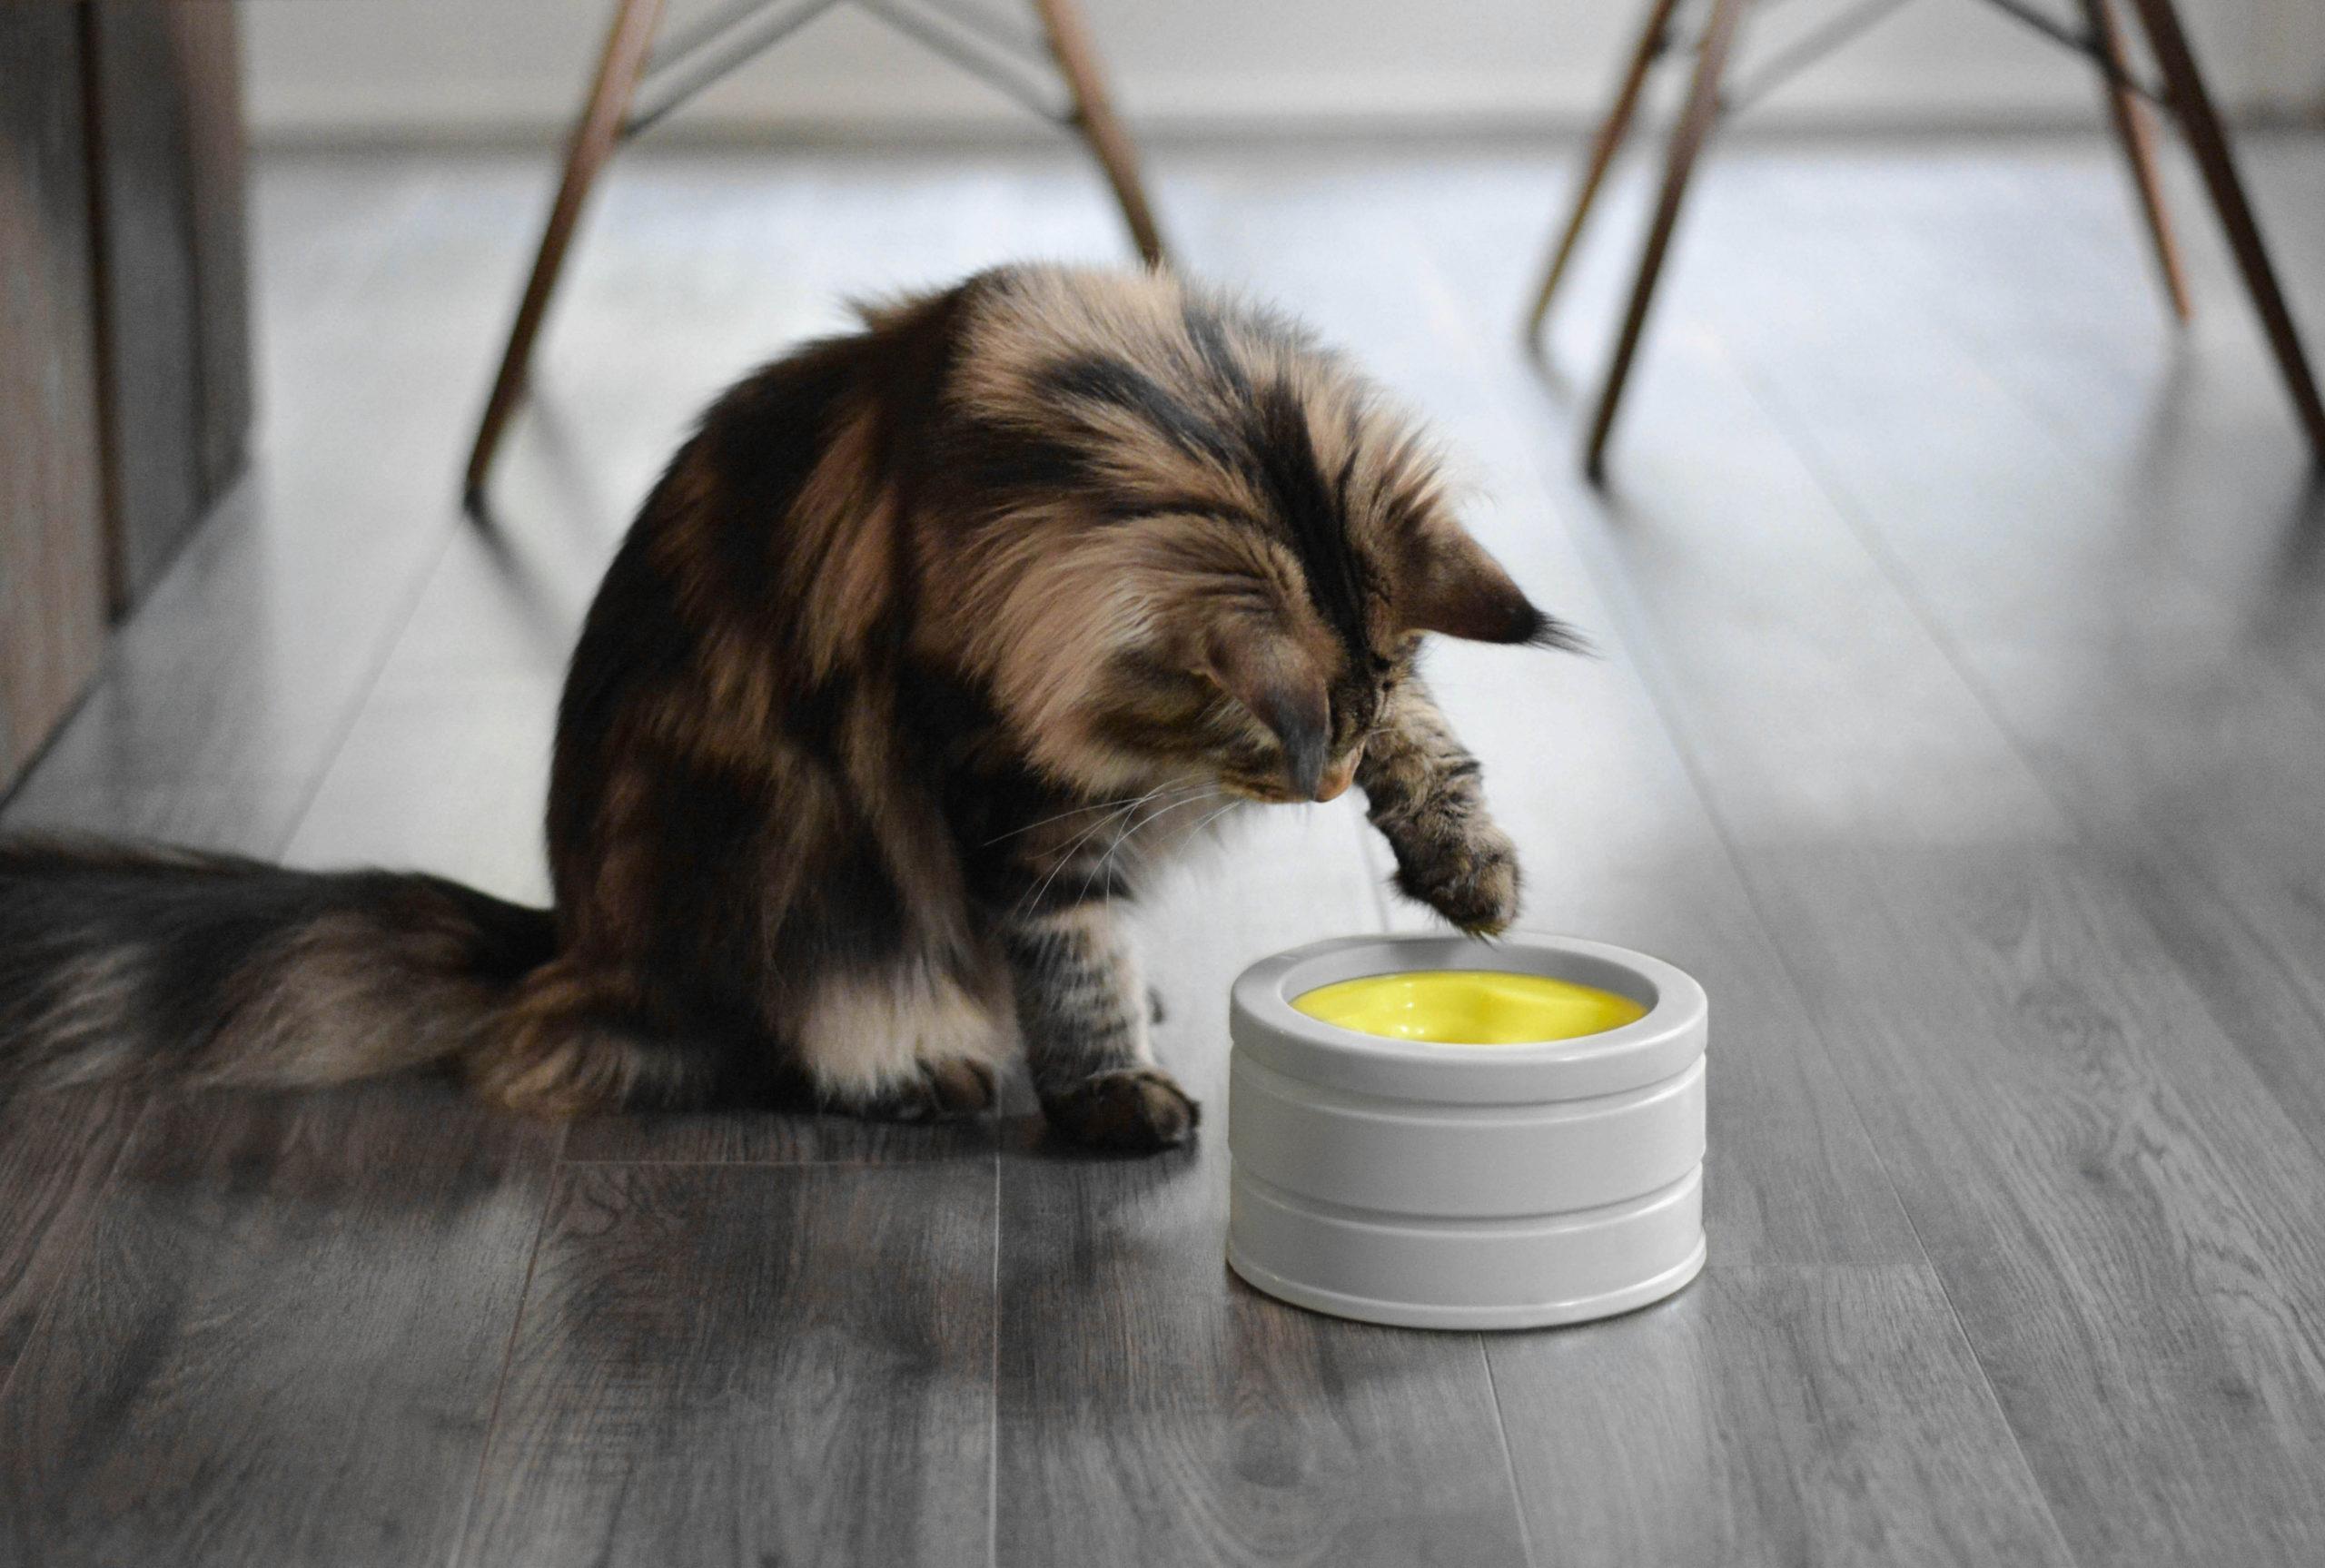 The Intellikatt food bowl